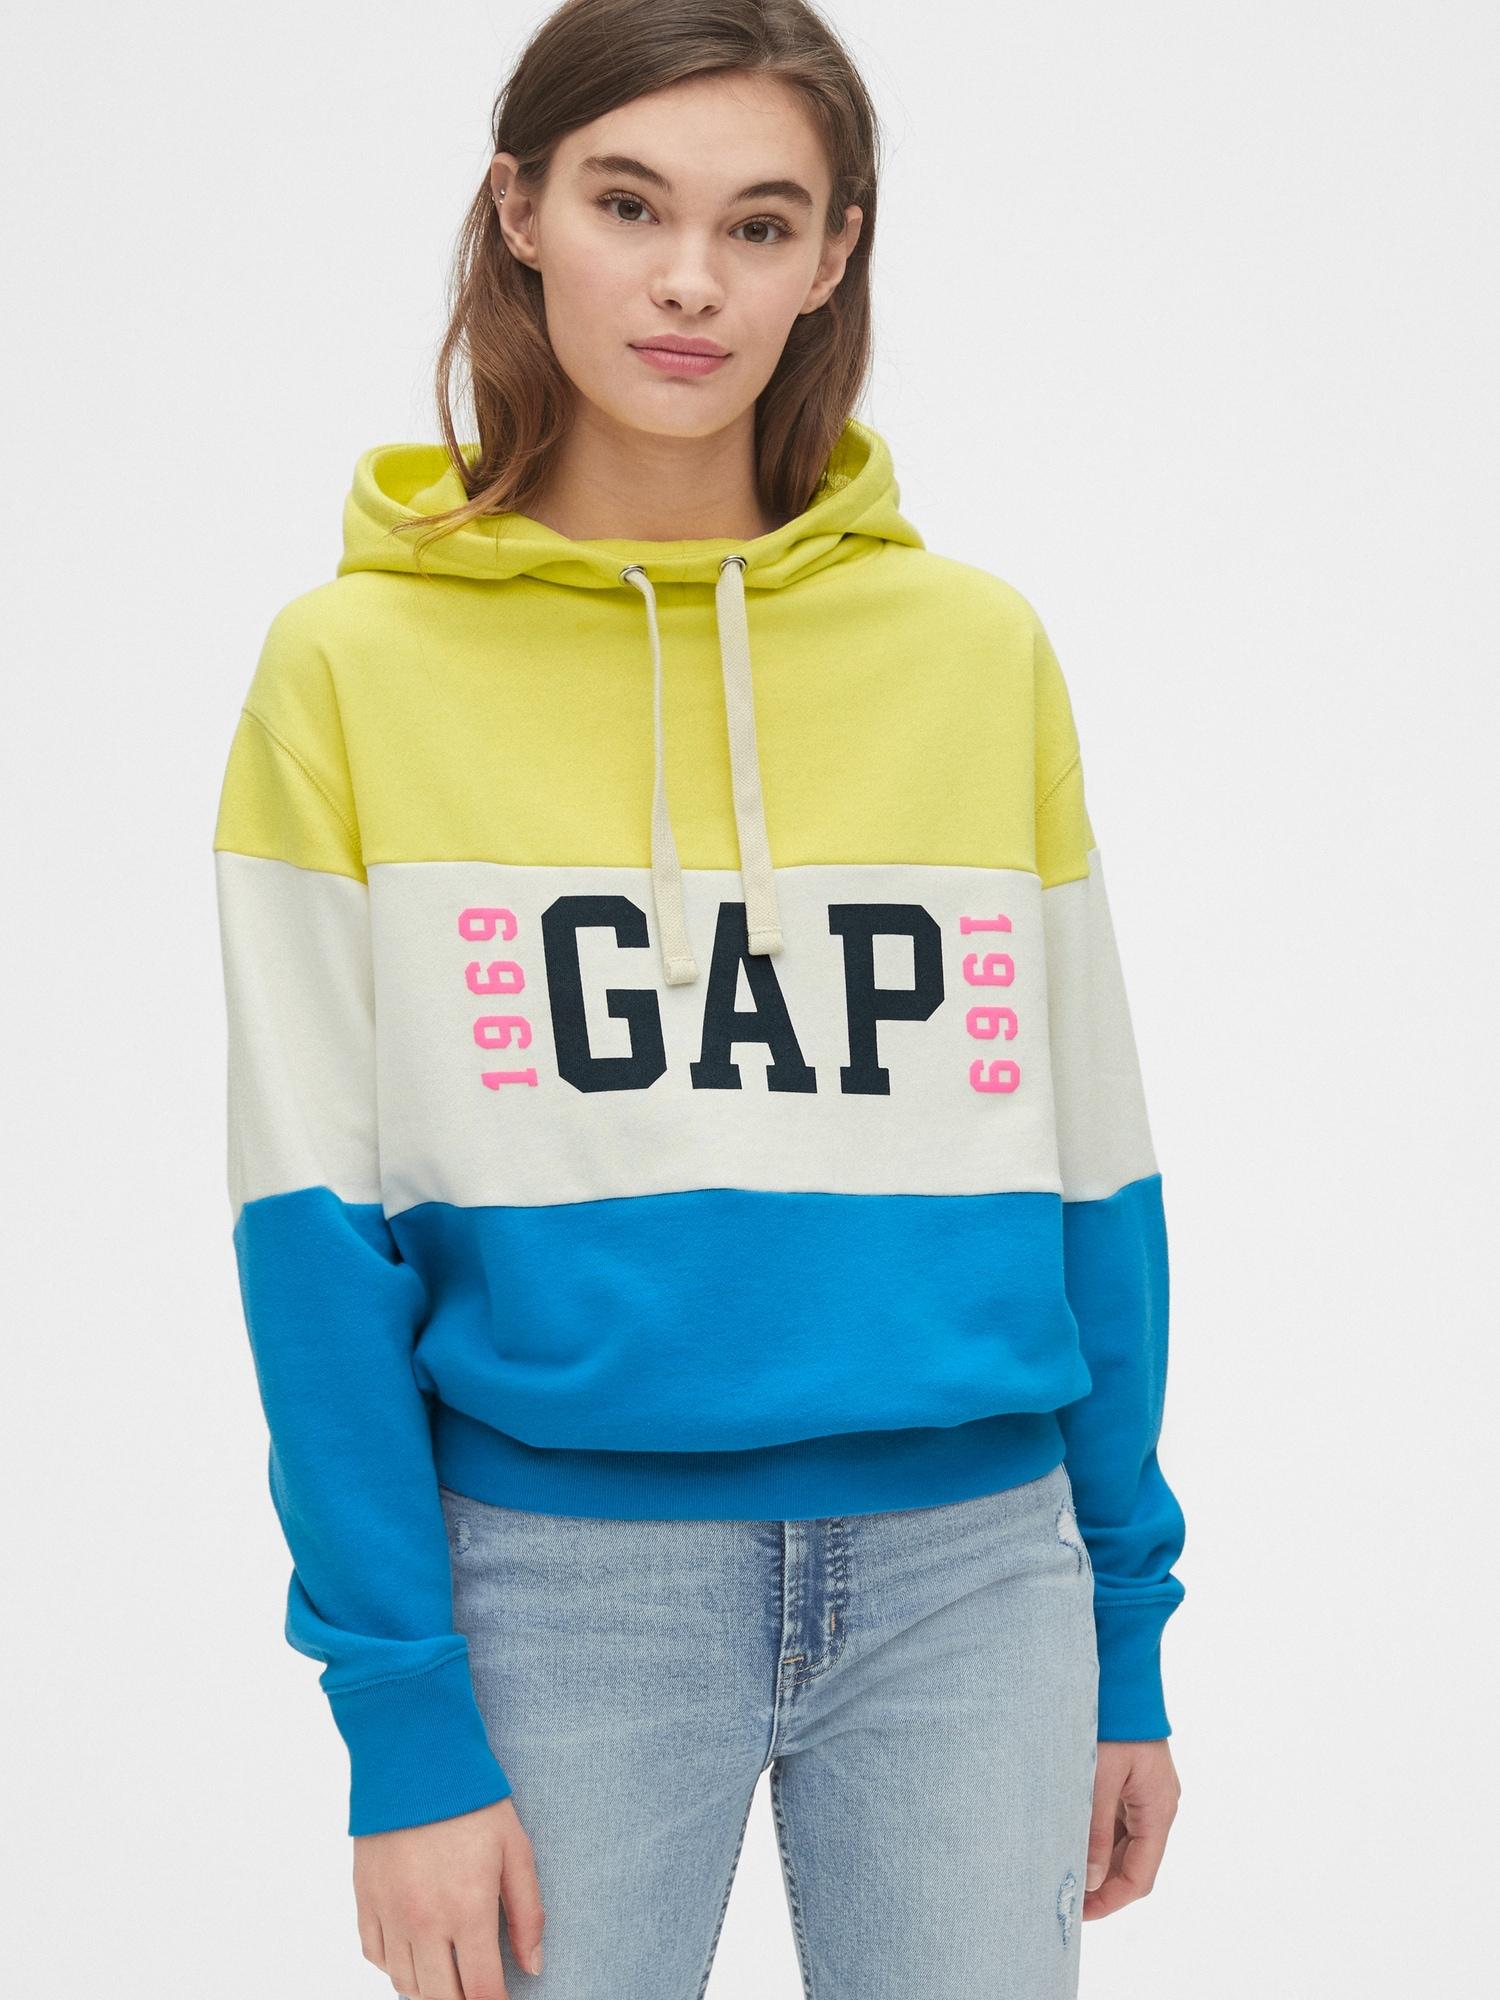 Gap 1969ロゴ ファネルネックパーカー